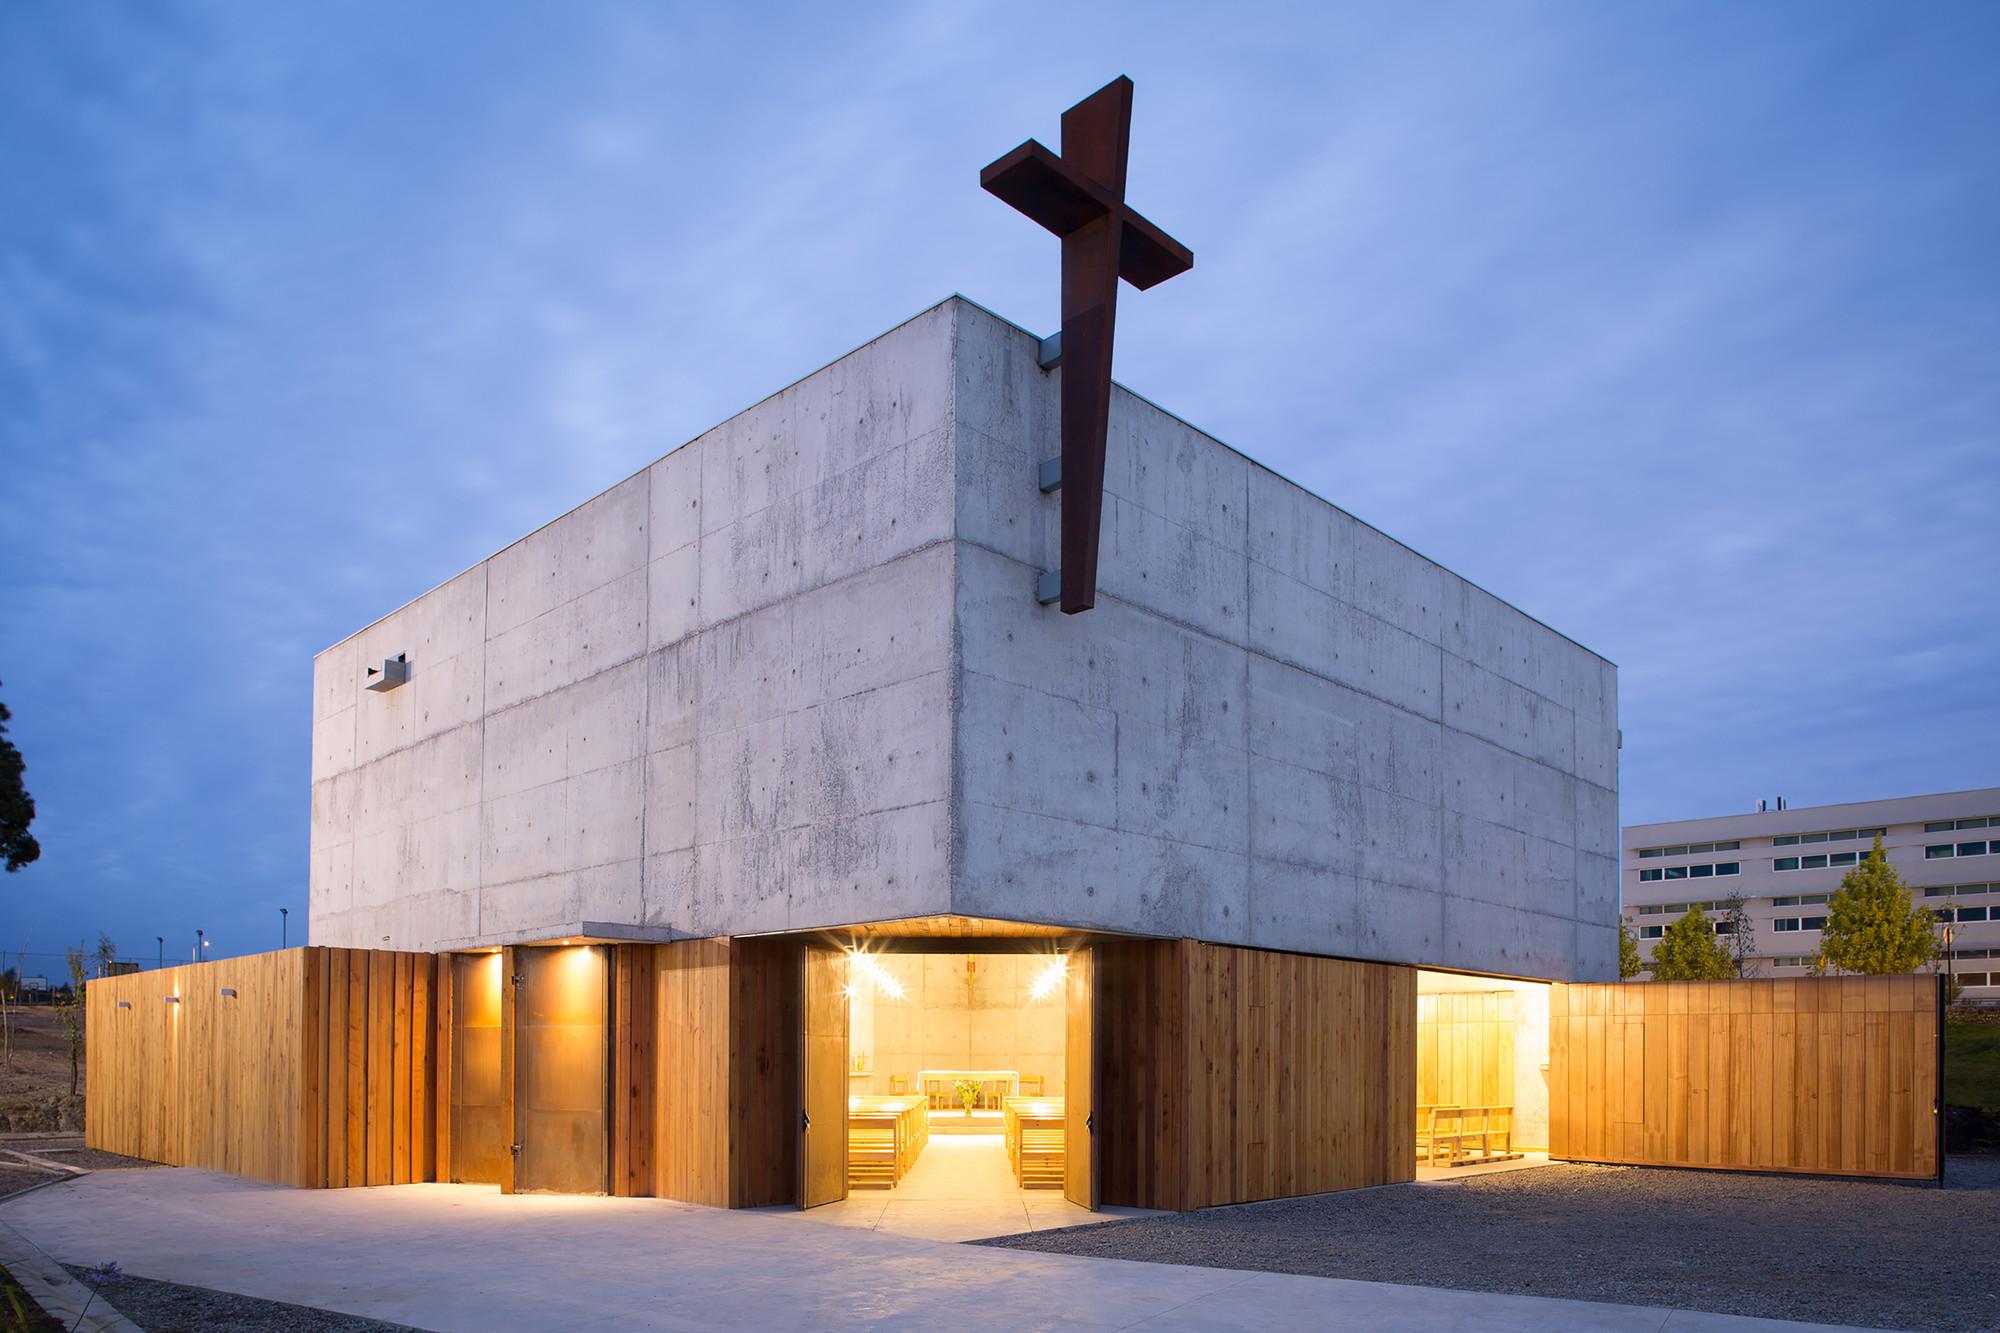 capilla-3921.jpg